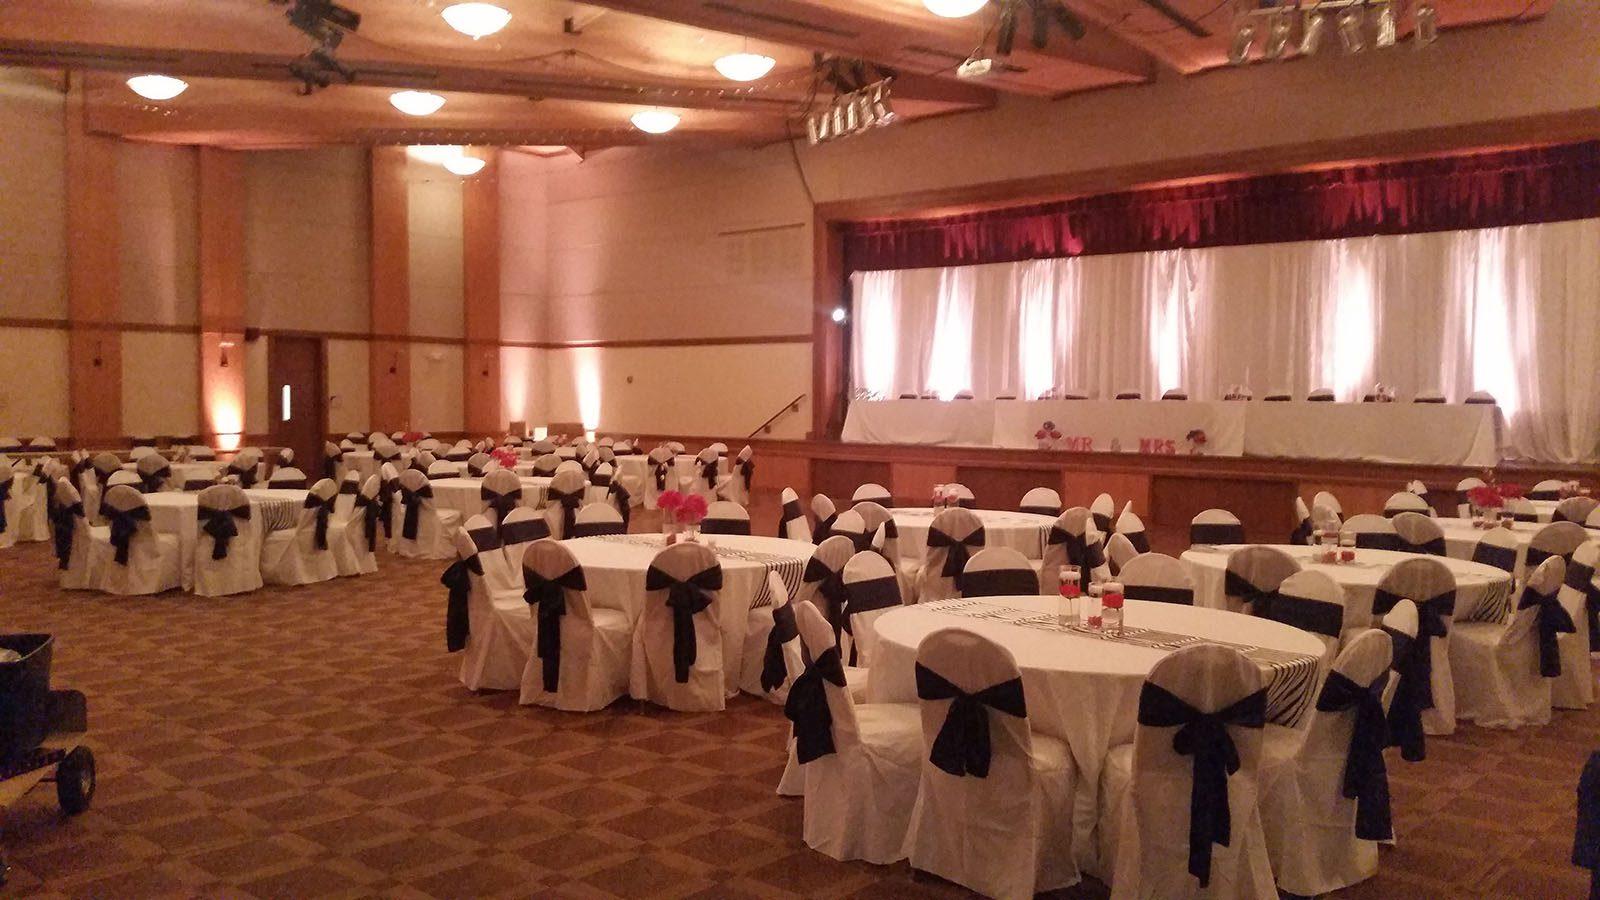 custom lighting drapery and decor